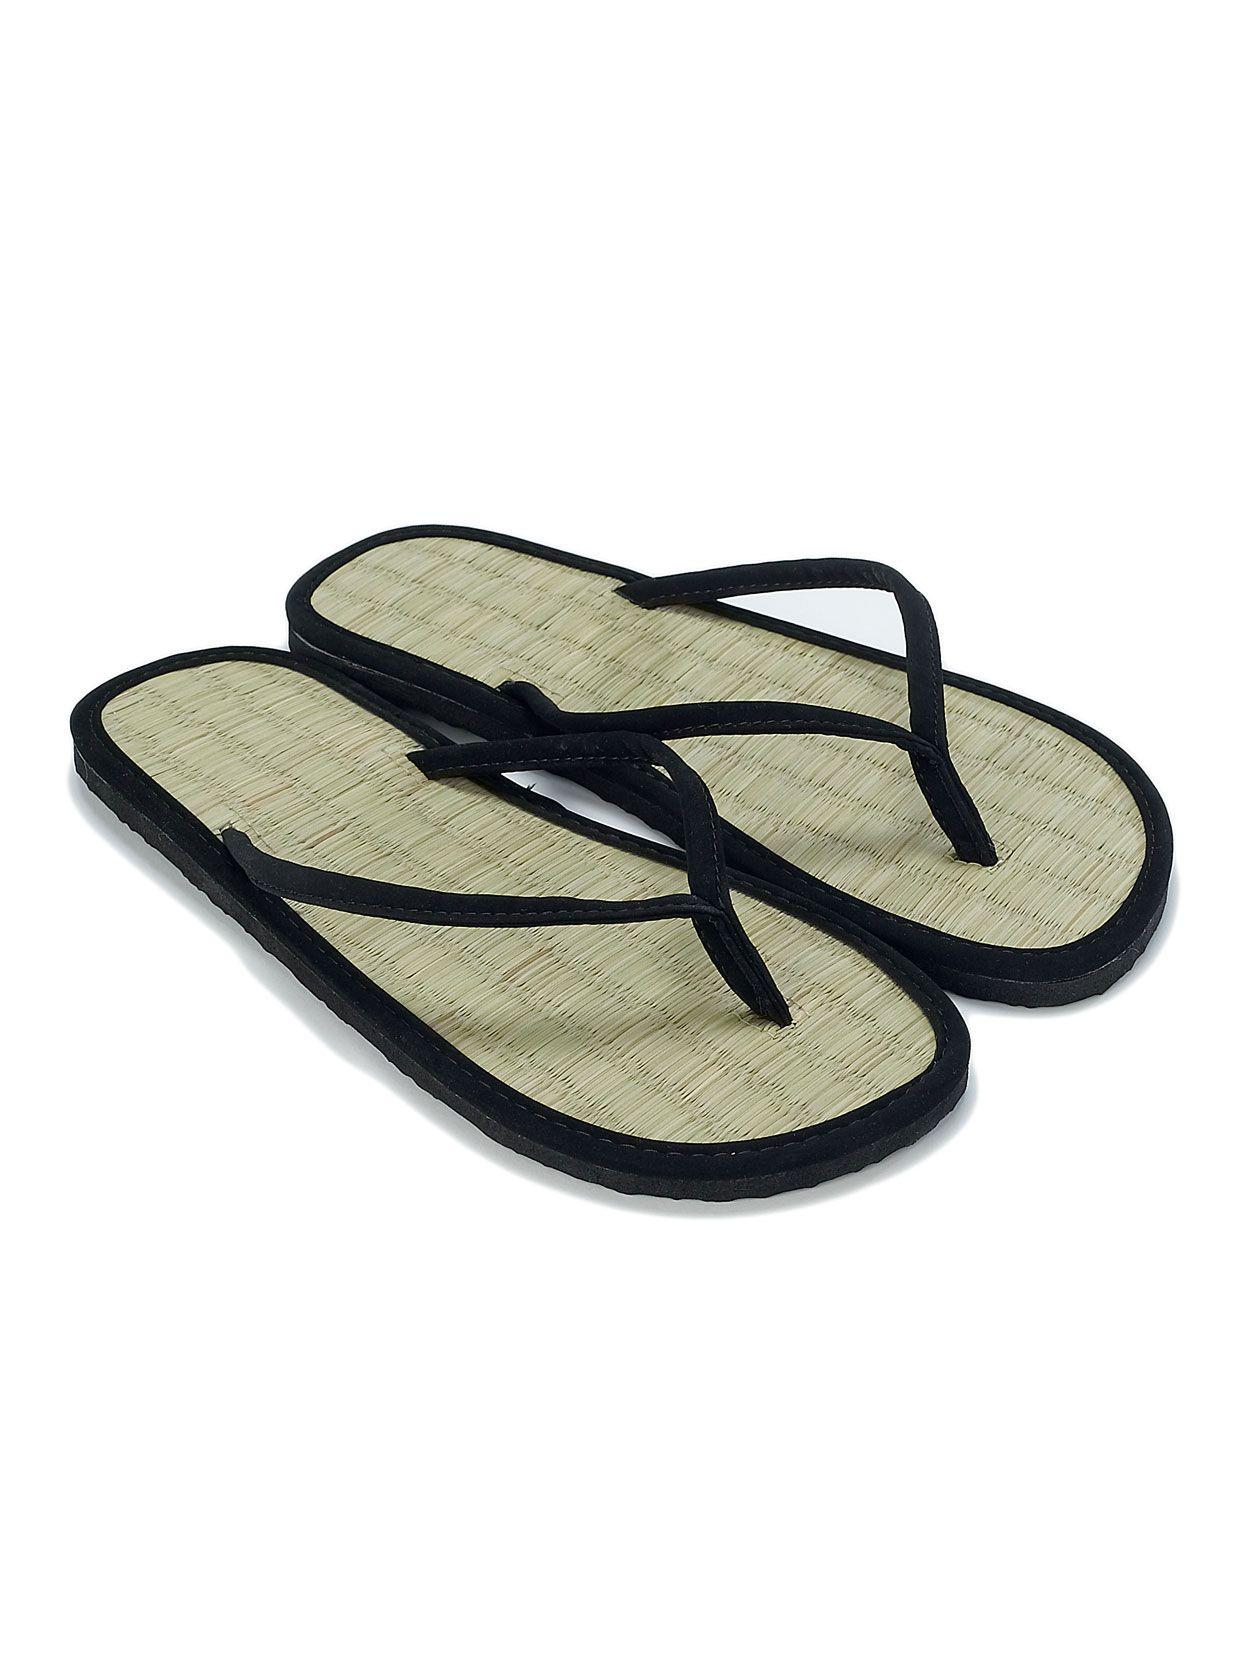 621b0c10f36a1a Plain Seagrass Flip Flops